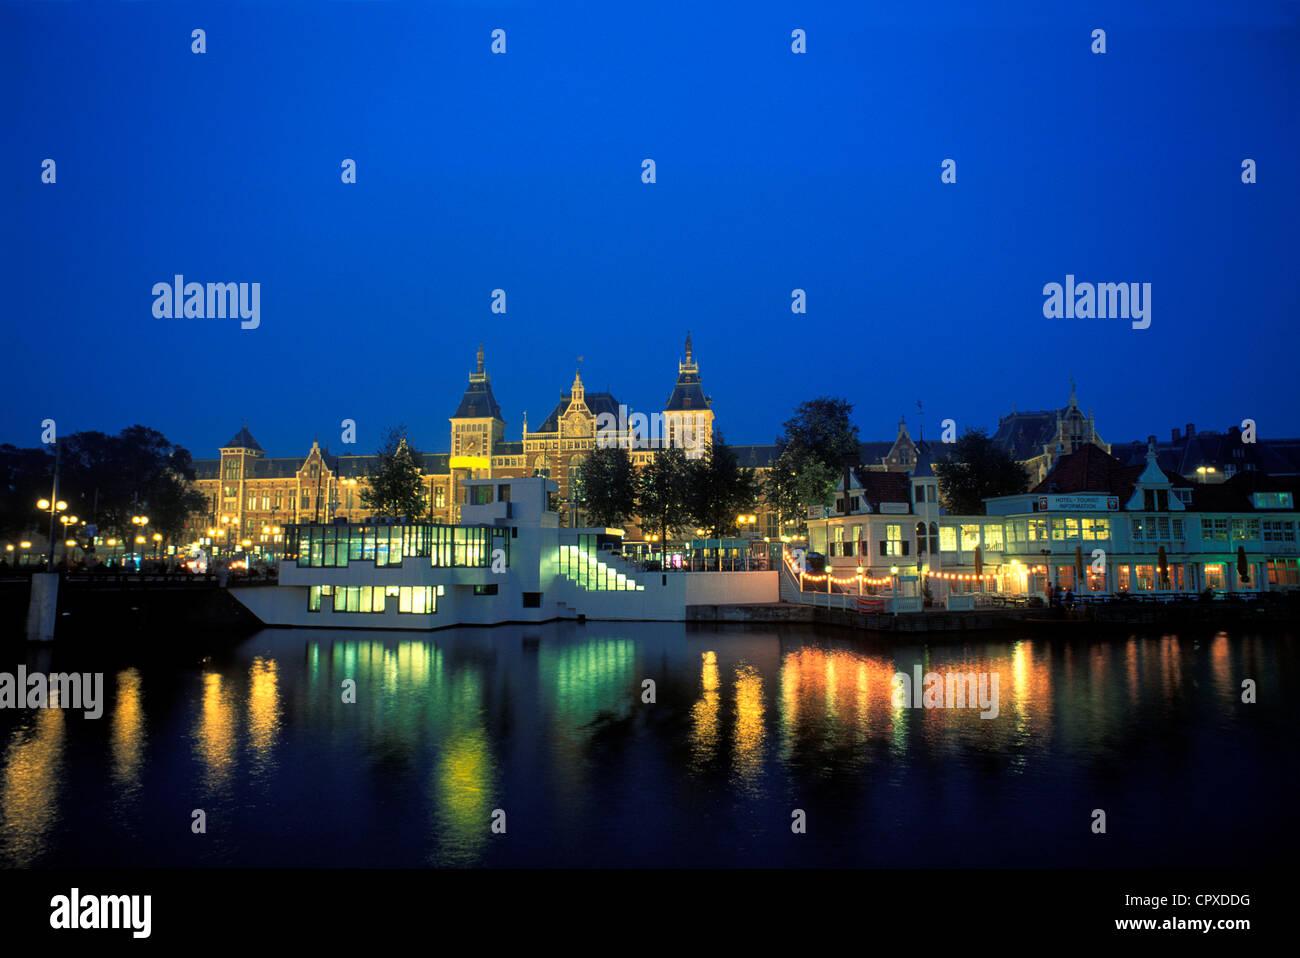 Netherlands, Amsterdam, the main station - Stock Image